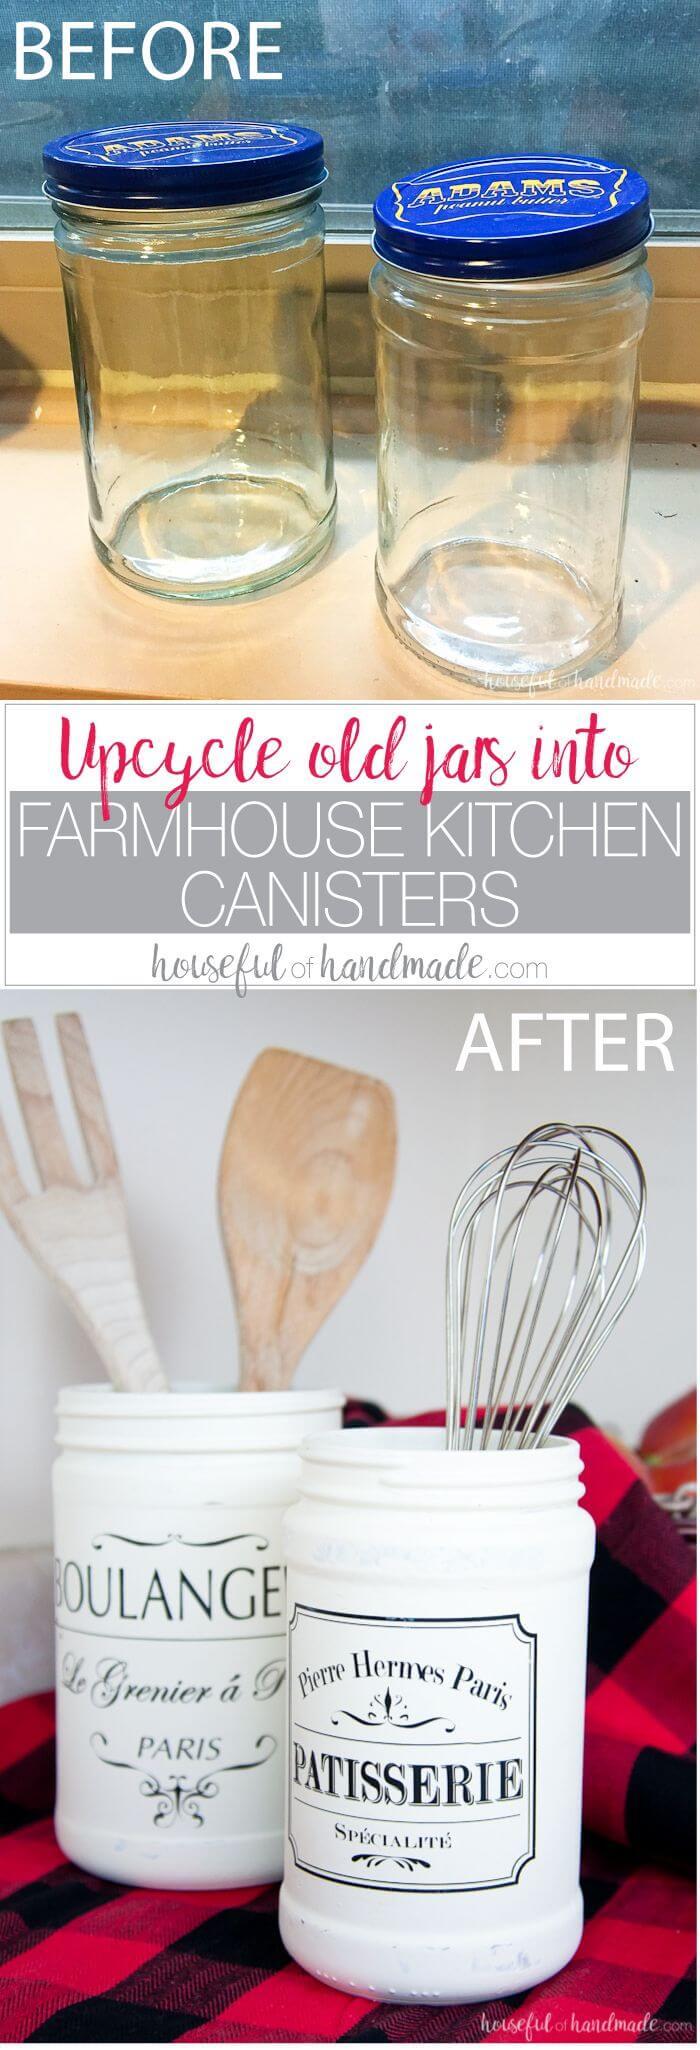 Make Old Jars into Vintage Inspired Canisters